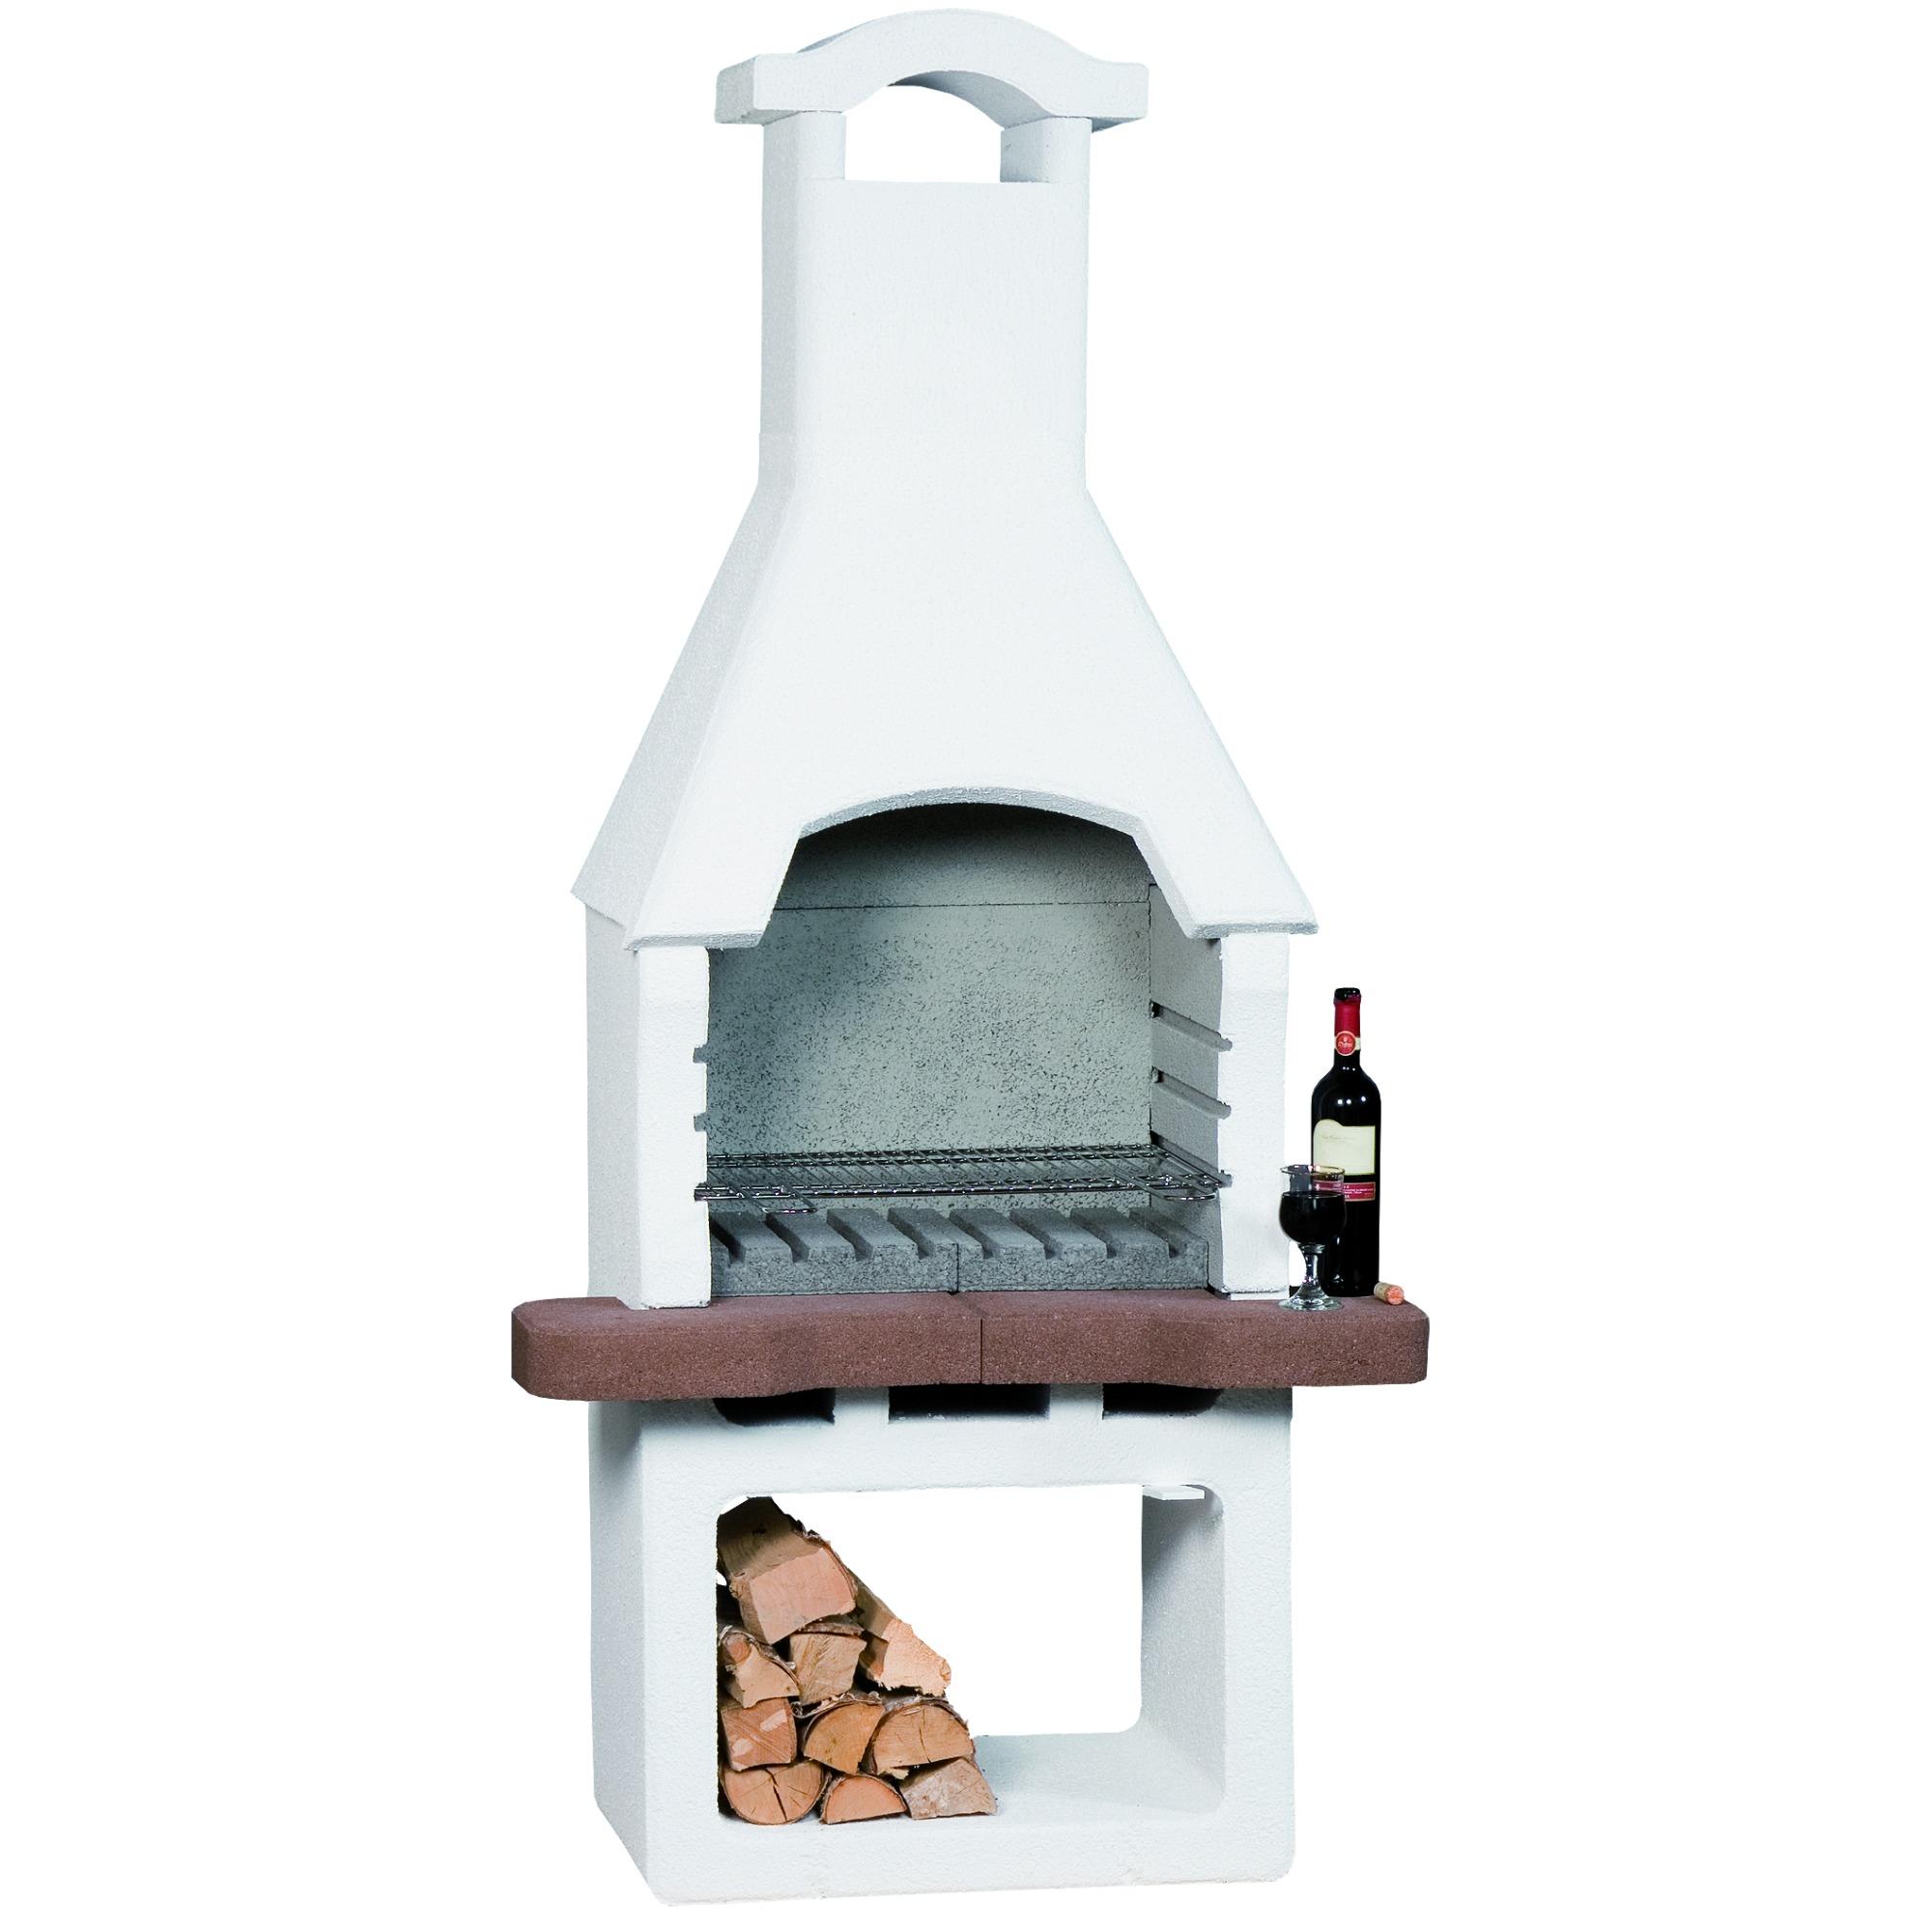 barbecue beton novus barbecues barbecue tuin gamma. Black Bedroom Furniture Sets. Home Design Ideas